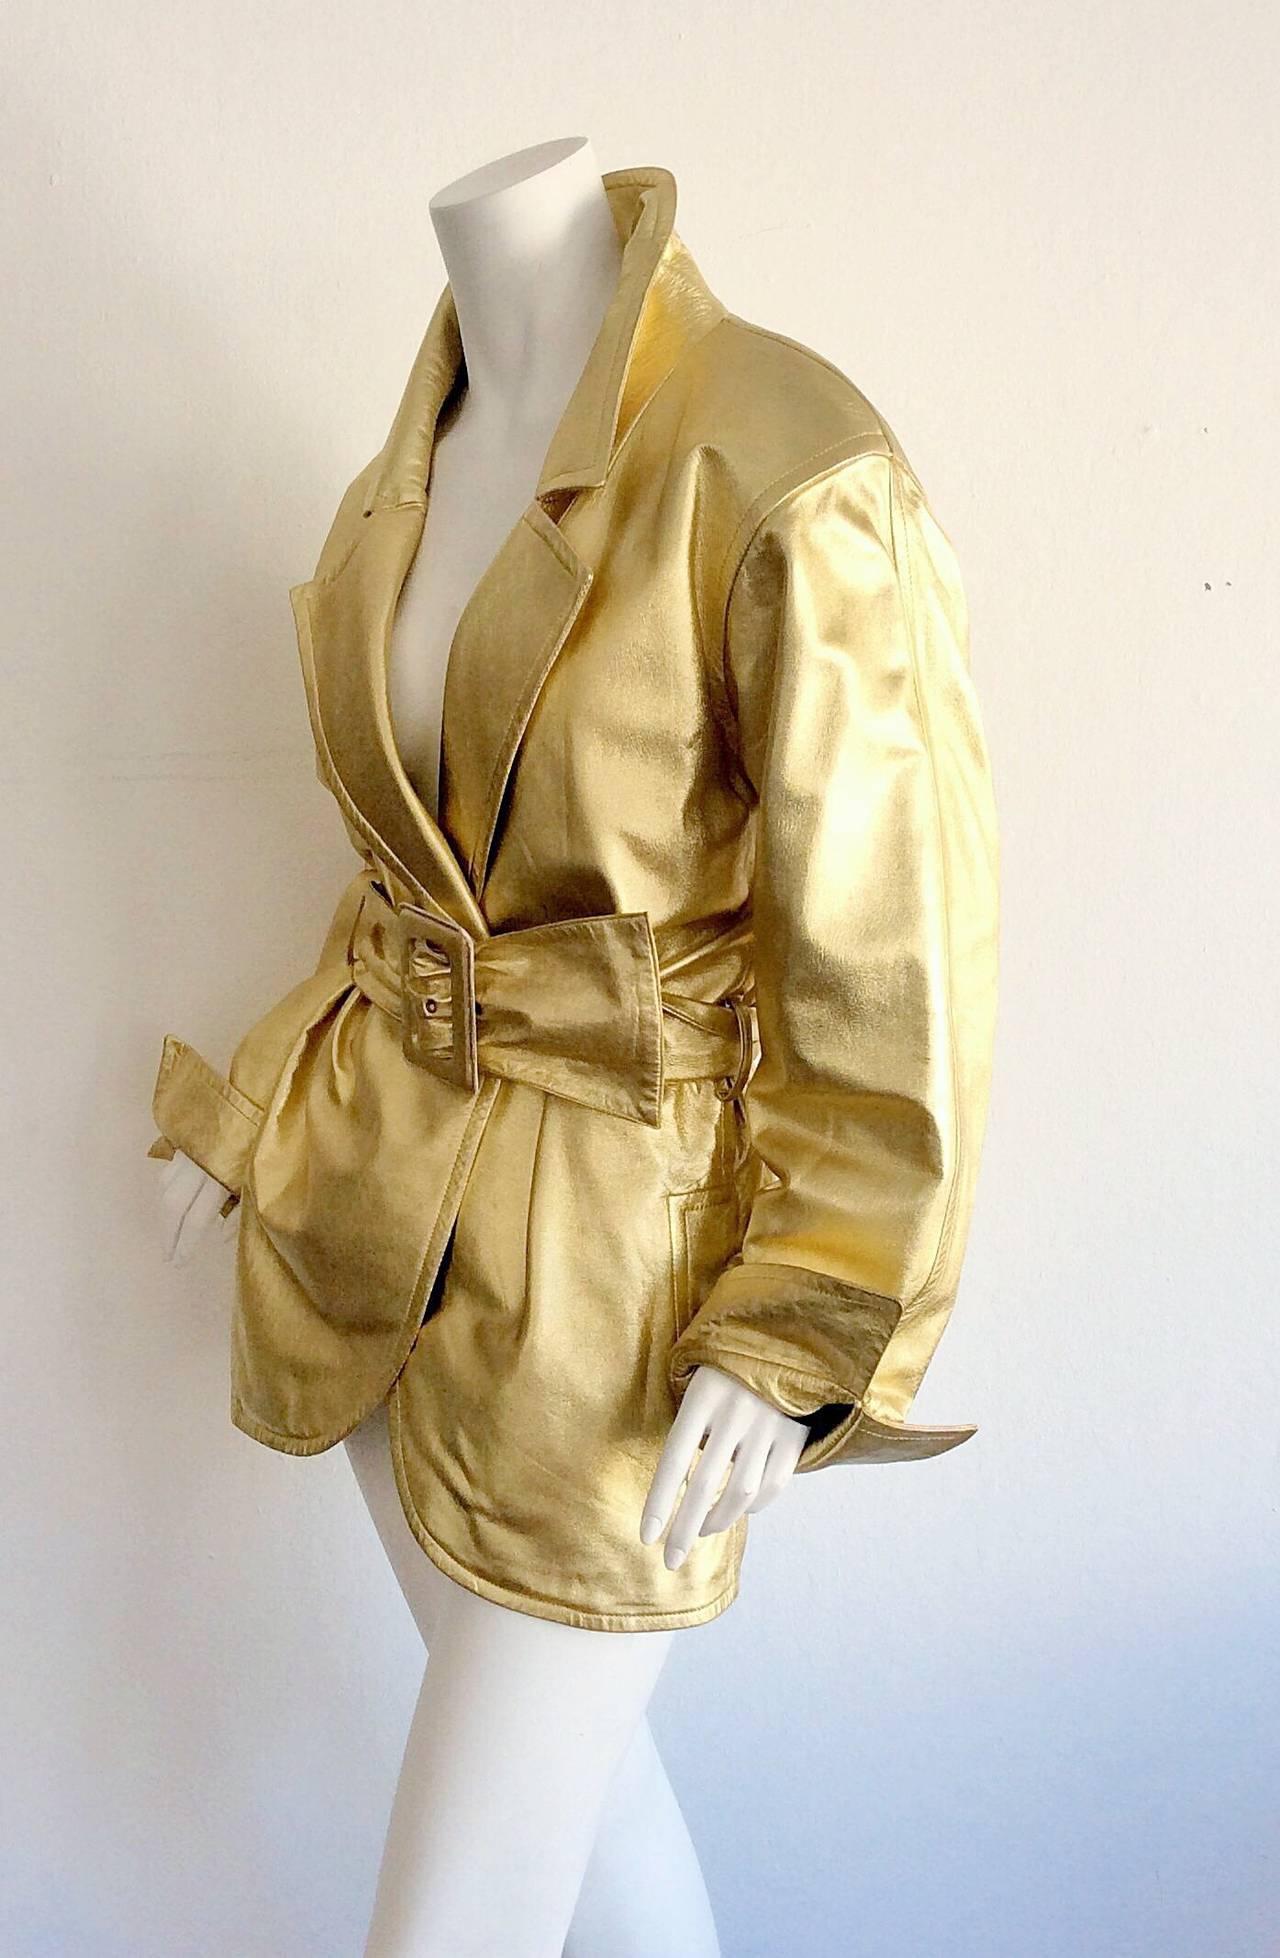 Vintage Yves Saint Laurent ' Rive Gauche ' Belted Gold Leather Jacket 10